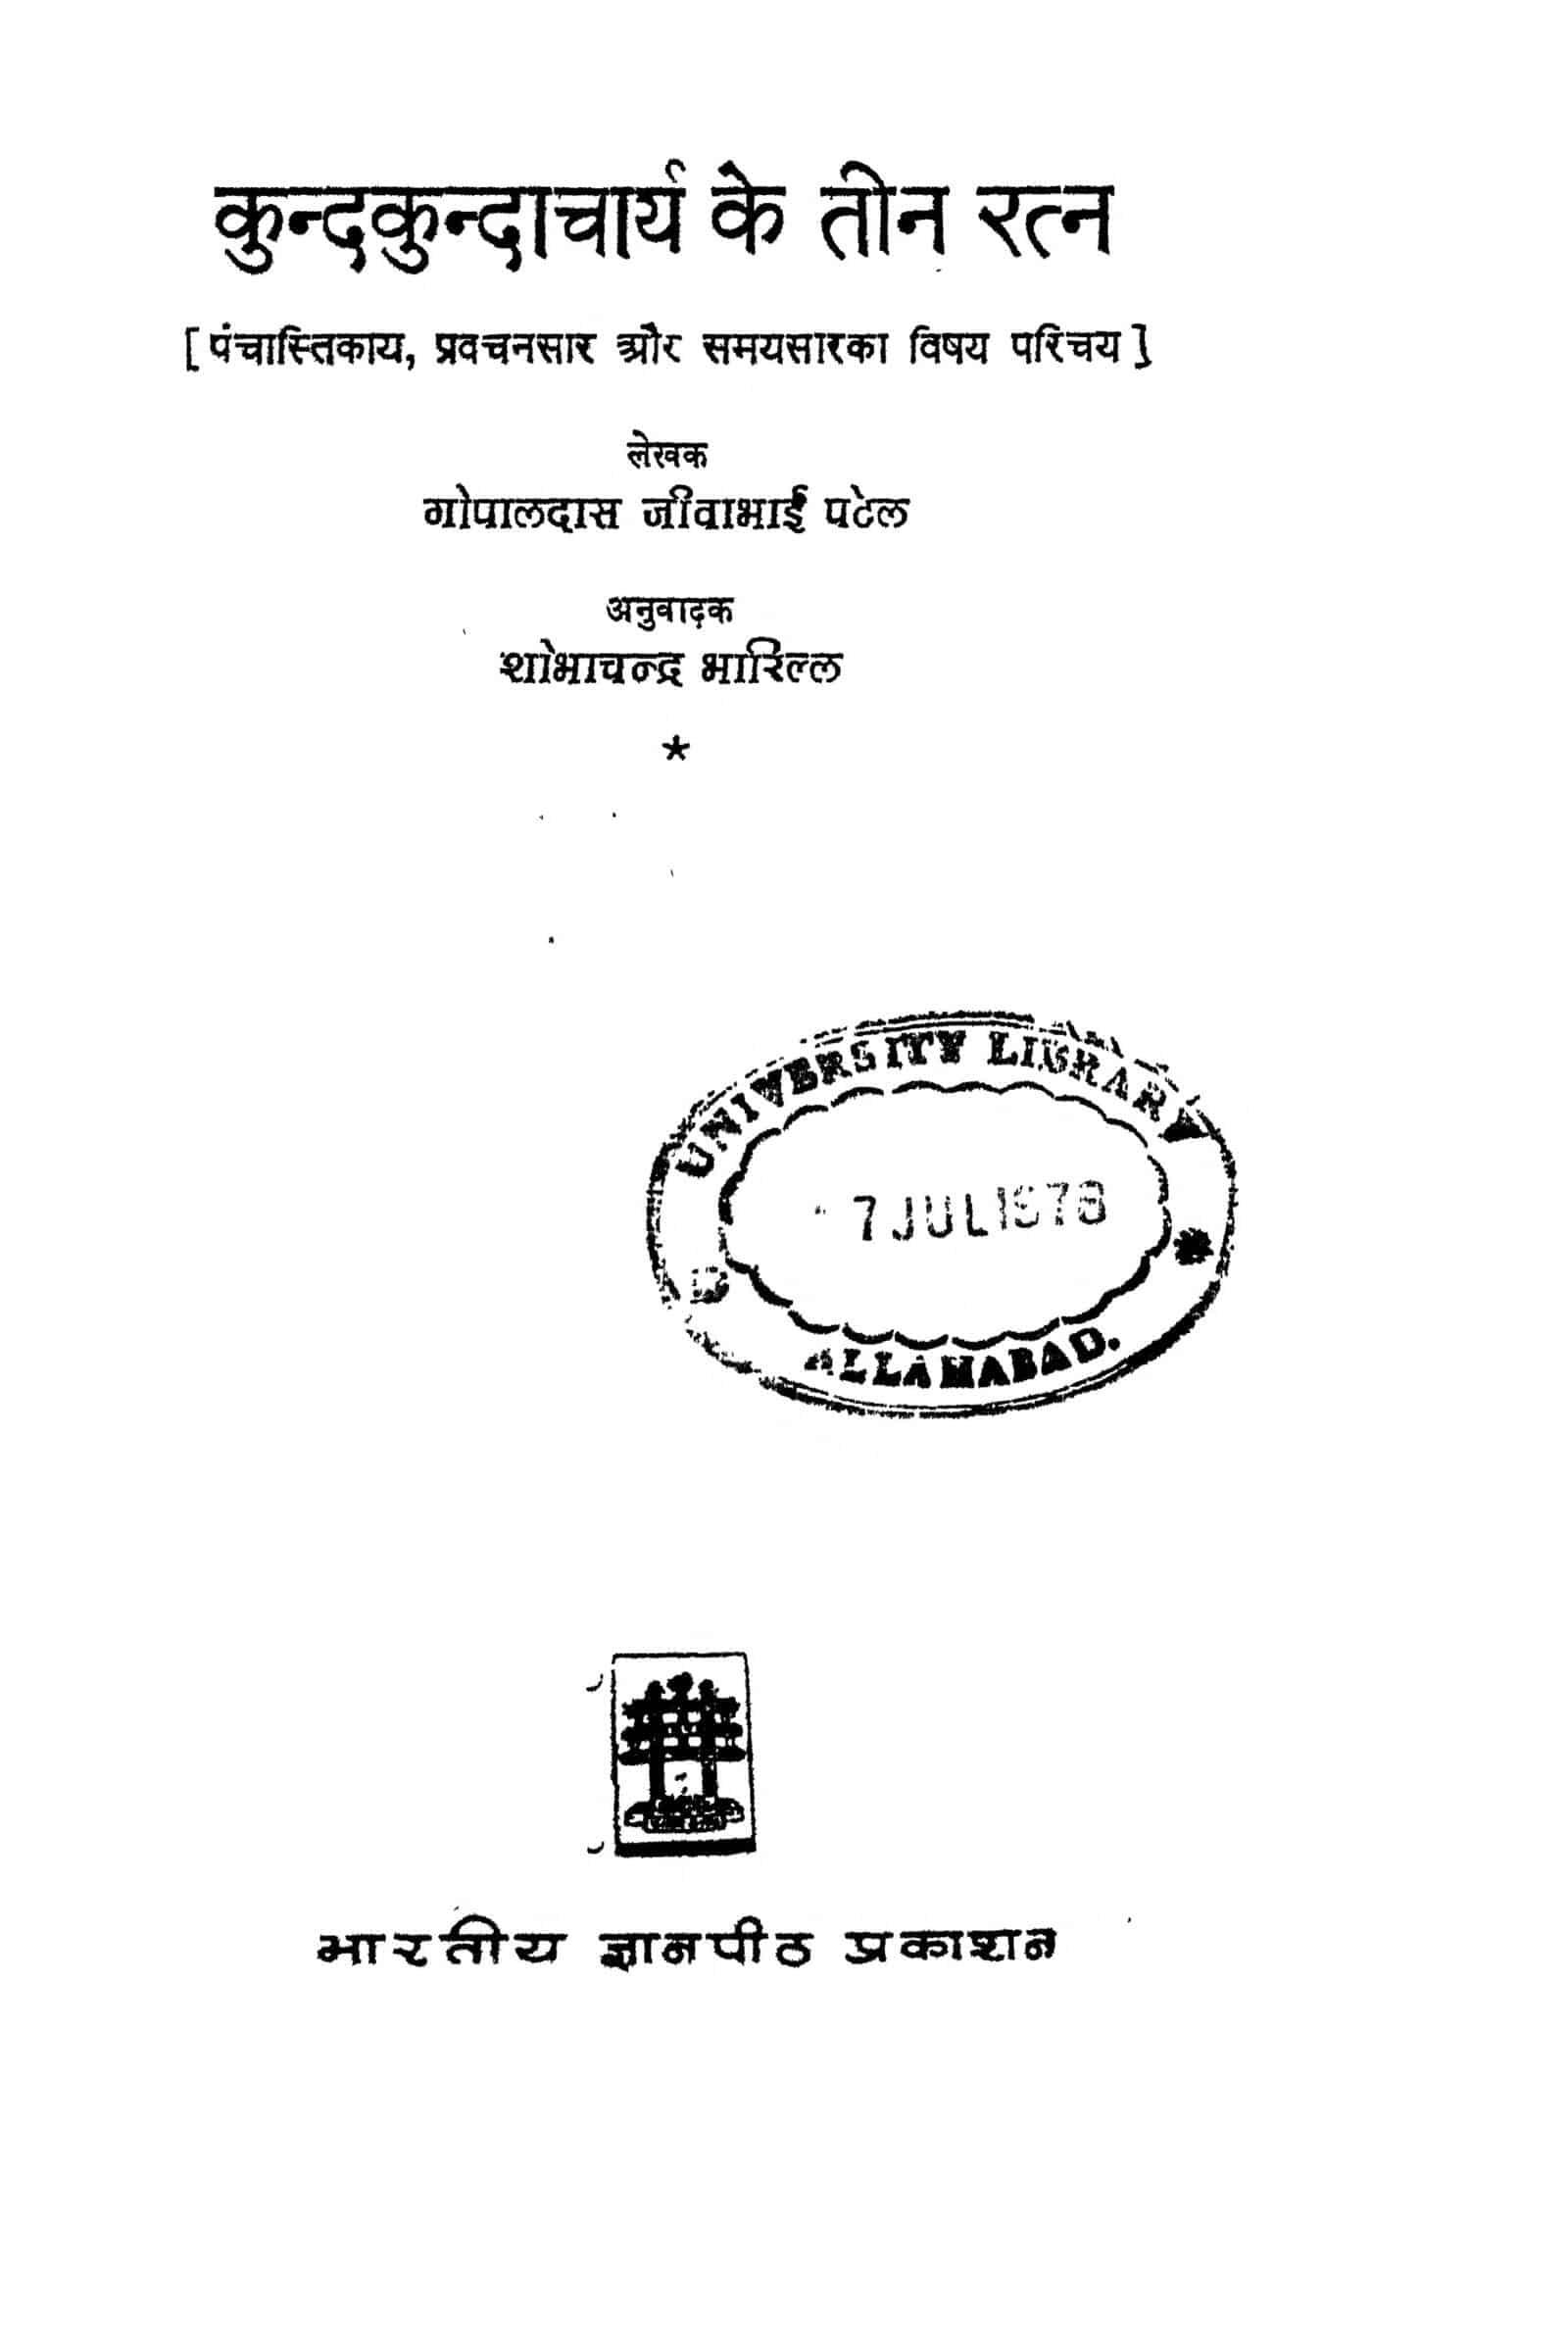 Book Image : कुन्दकुन्दाचार्य के तीन रत्न  - Kundakundaacharya Ke Tin Ratn